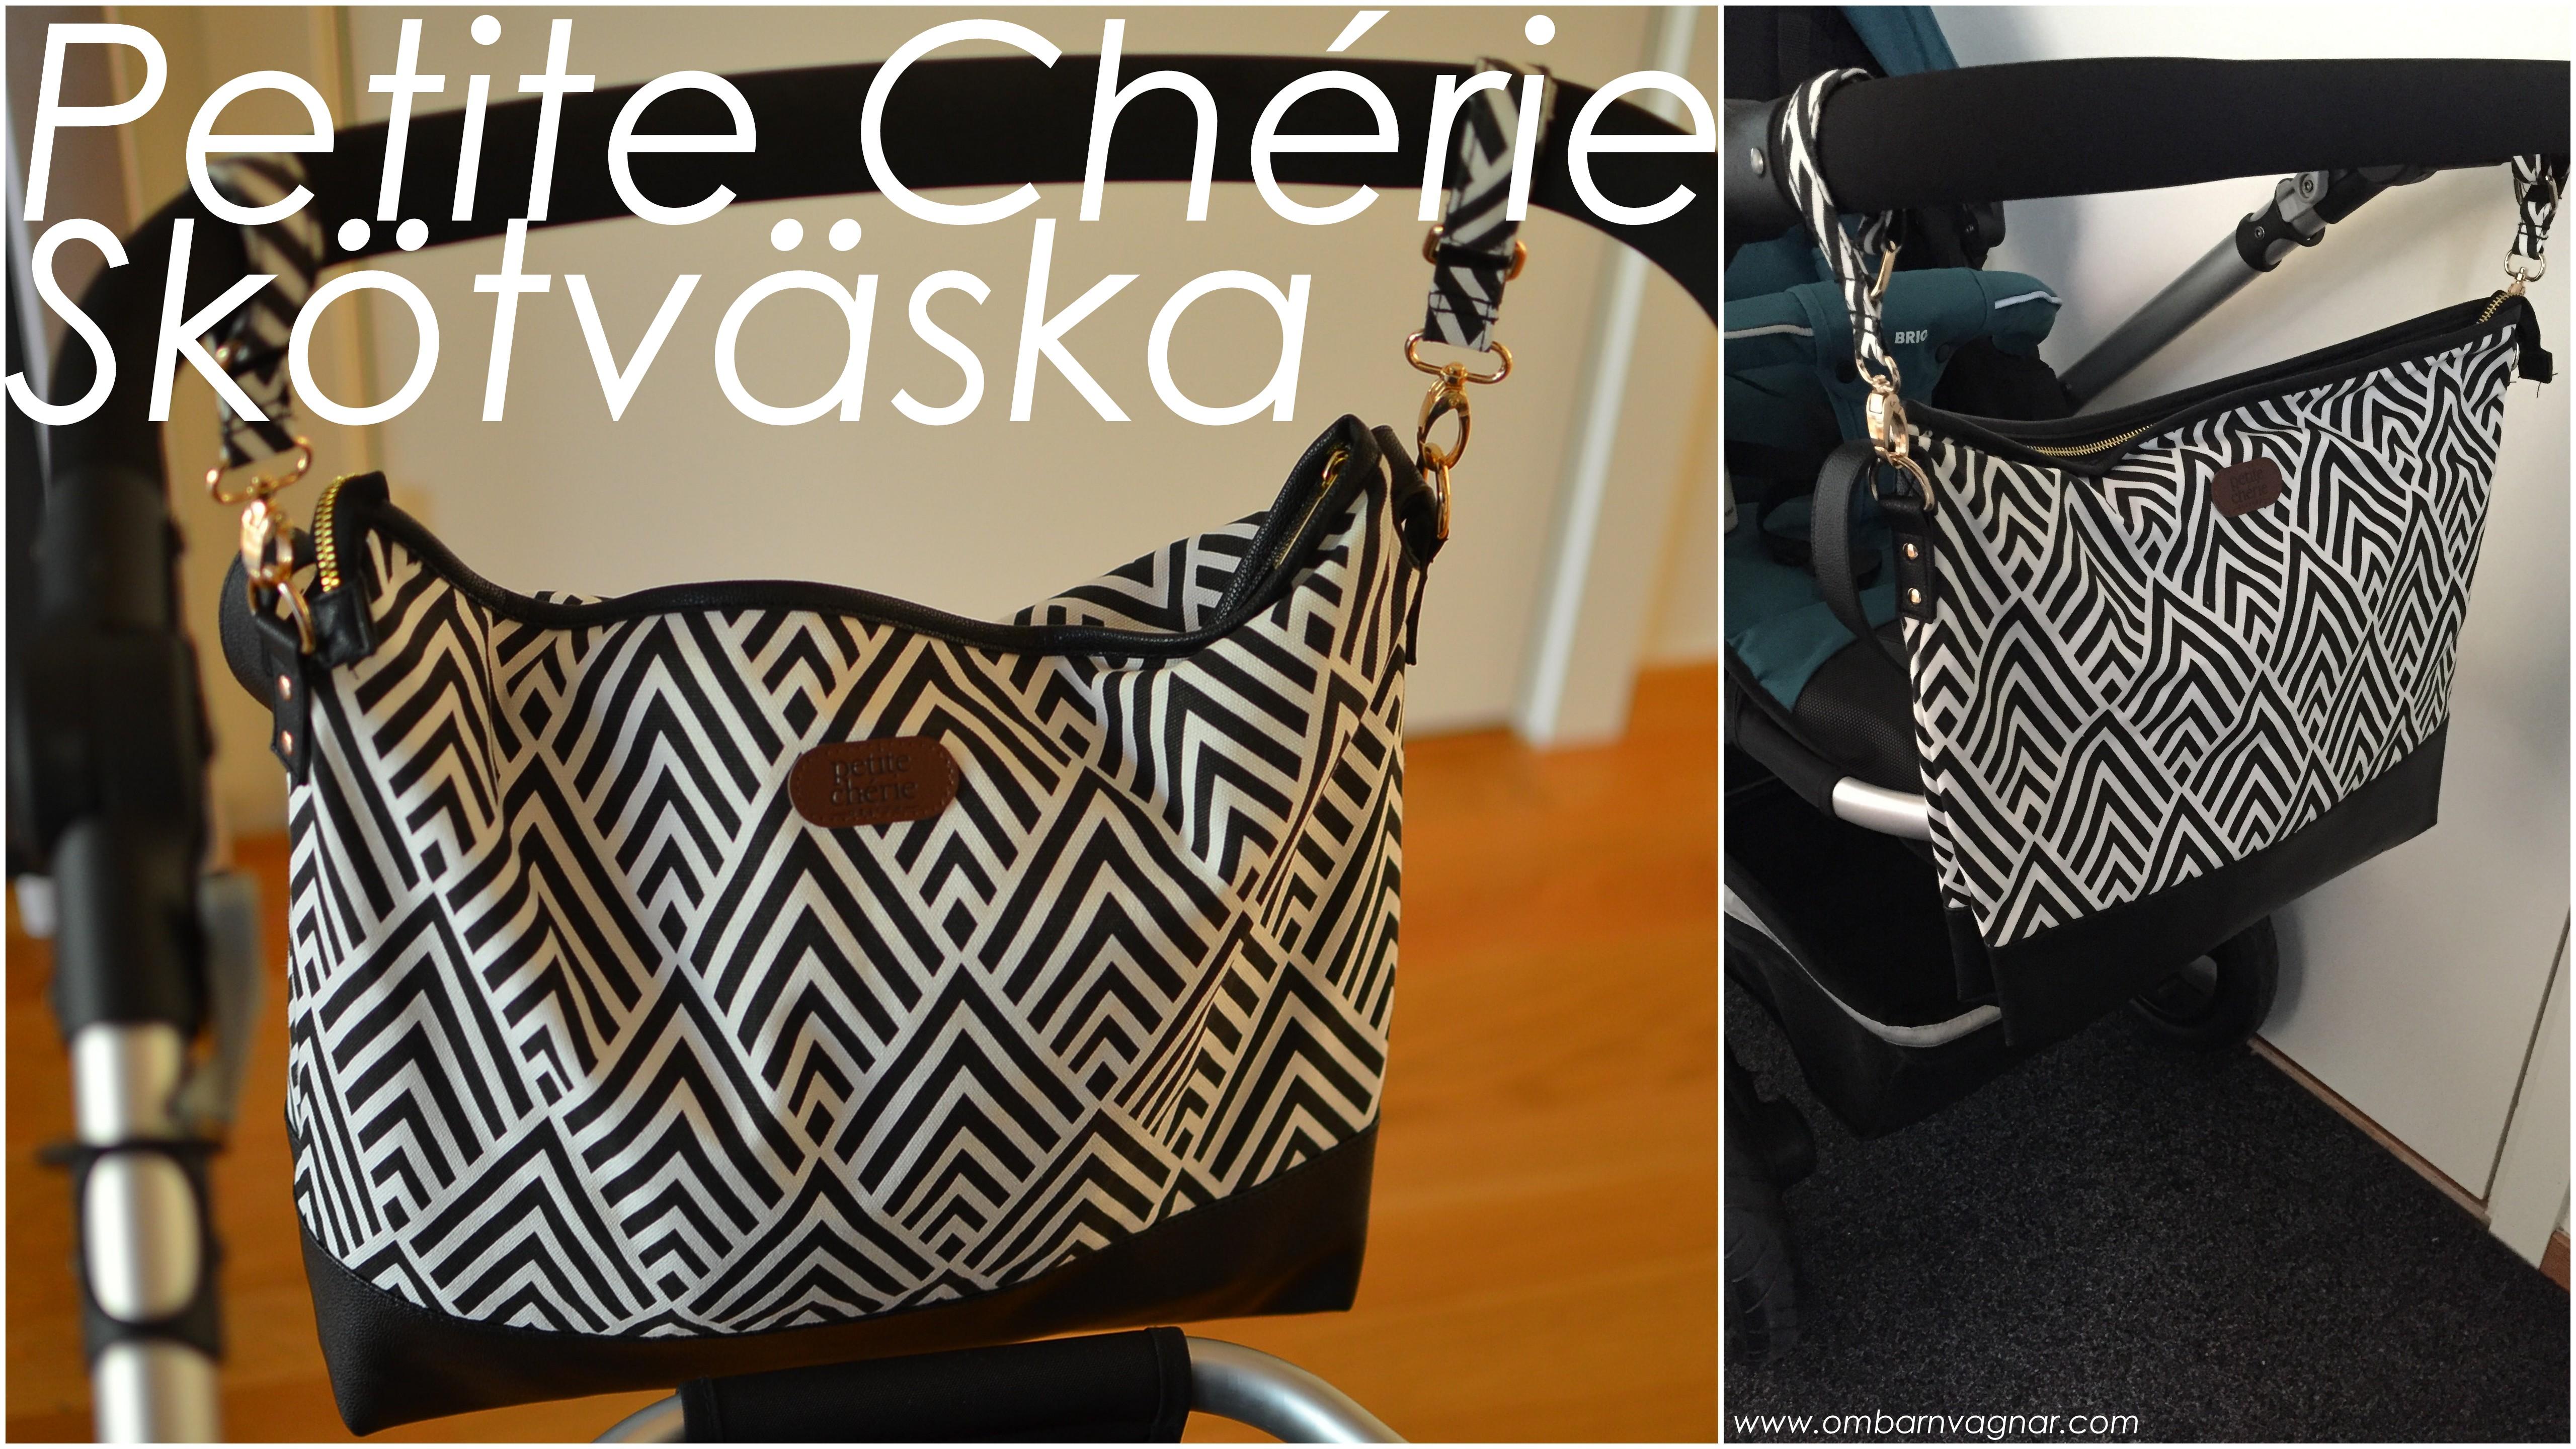 Petite-Cherie-skotvaska-first